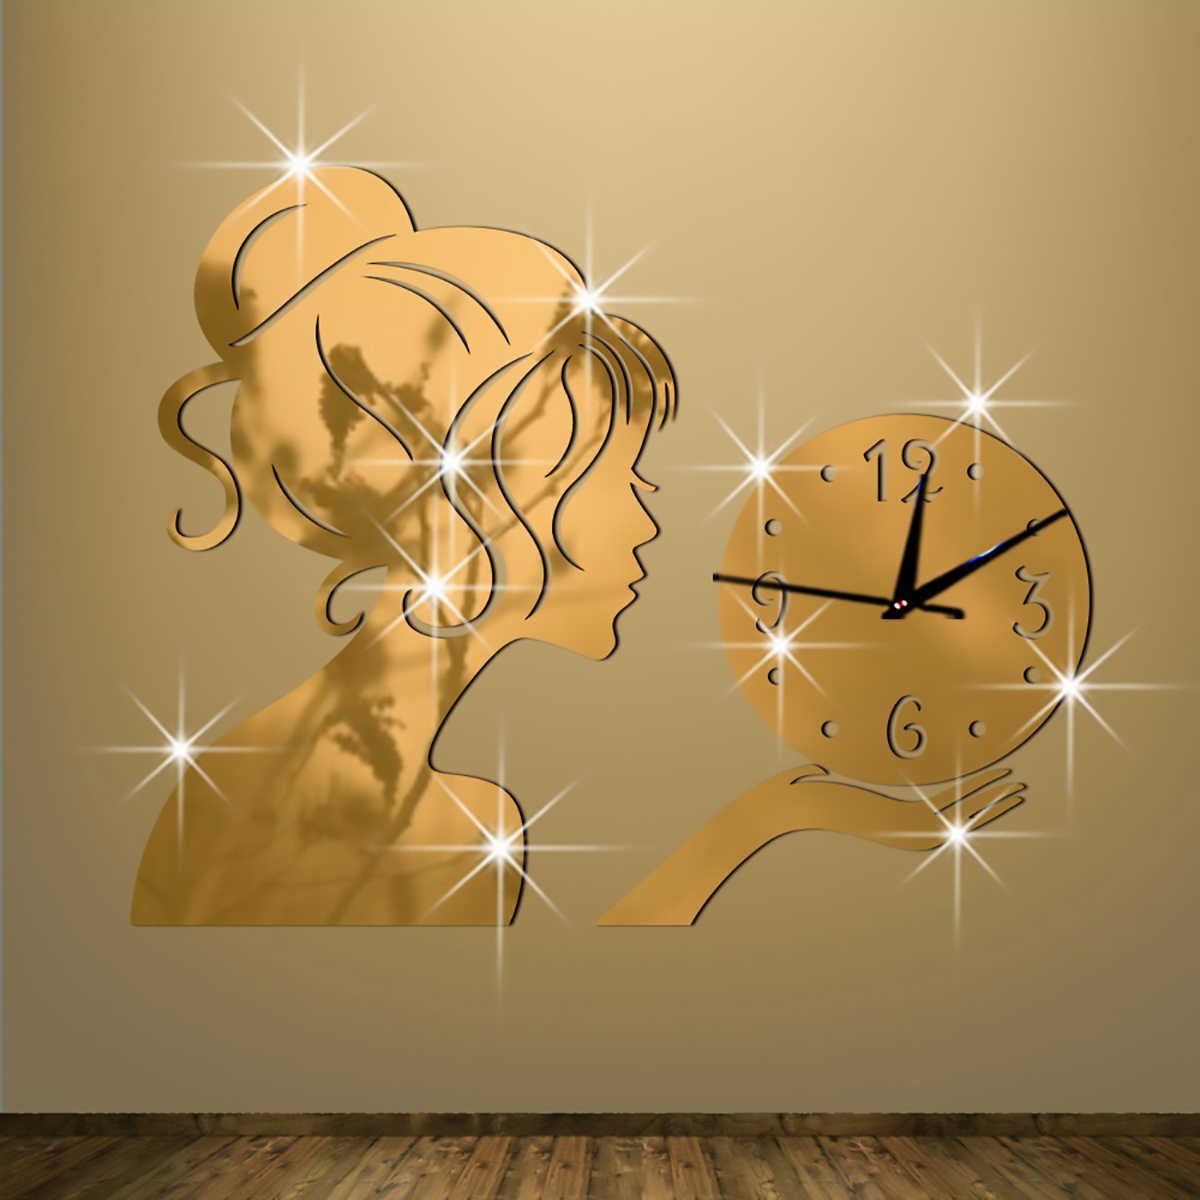 Diy 3D Meisje Spiegel Wandklokken Acryl Quartz Wandklokken Mode Woonkamer Spiegel Muurstickers Office Home Decoratie Hot Nieuwe